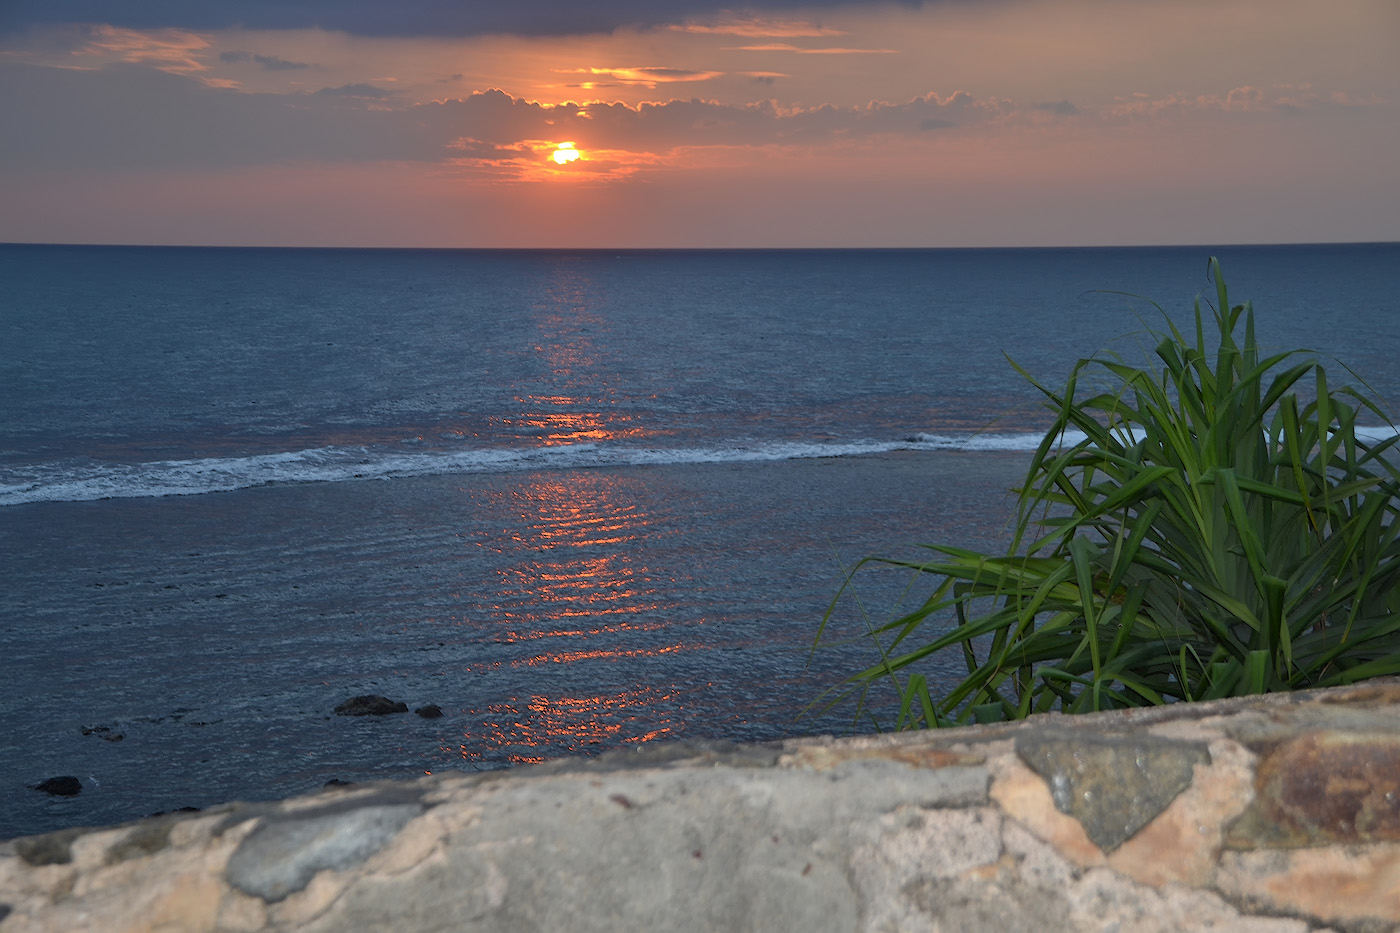 Фото 9. Чем славится Шри-Ланка? Своими невероятными закатами! Вечер на пляже Унаватуна. Настройки: 1/125, 5, 110, 55.